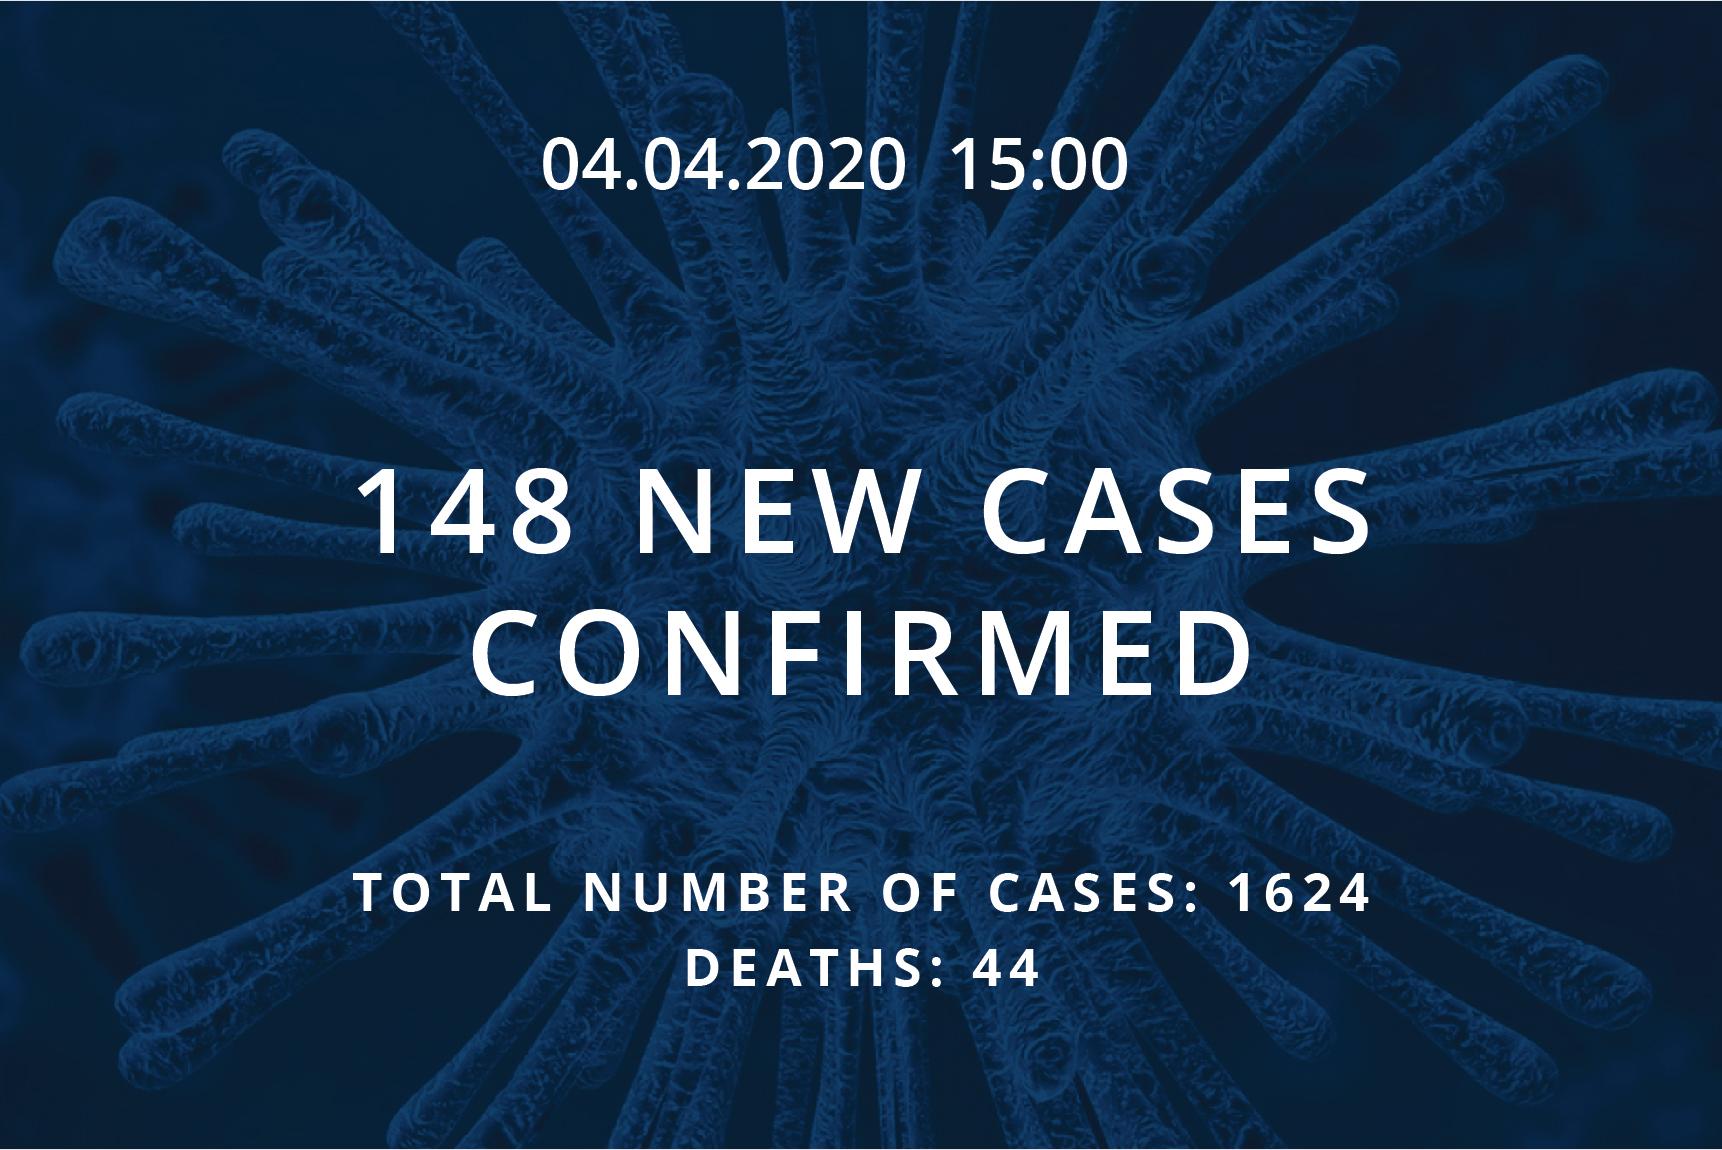 Information about coronavirus COVID-19, 04.04.2020 at 15:00